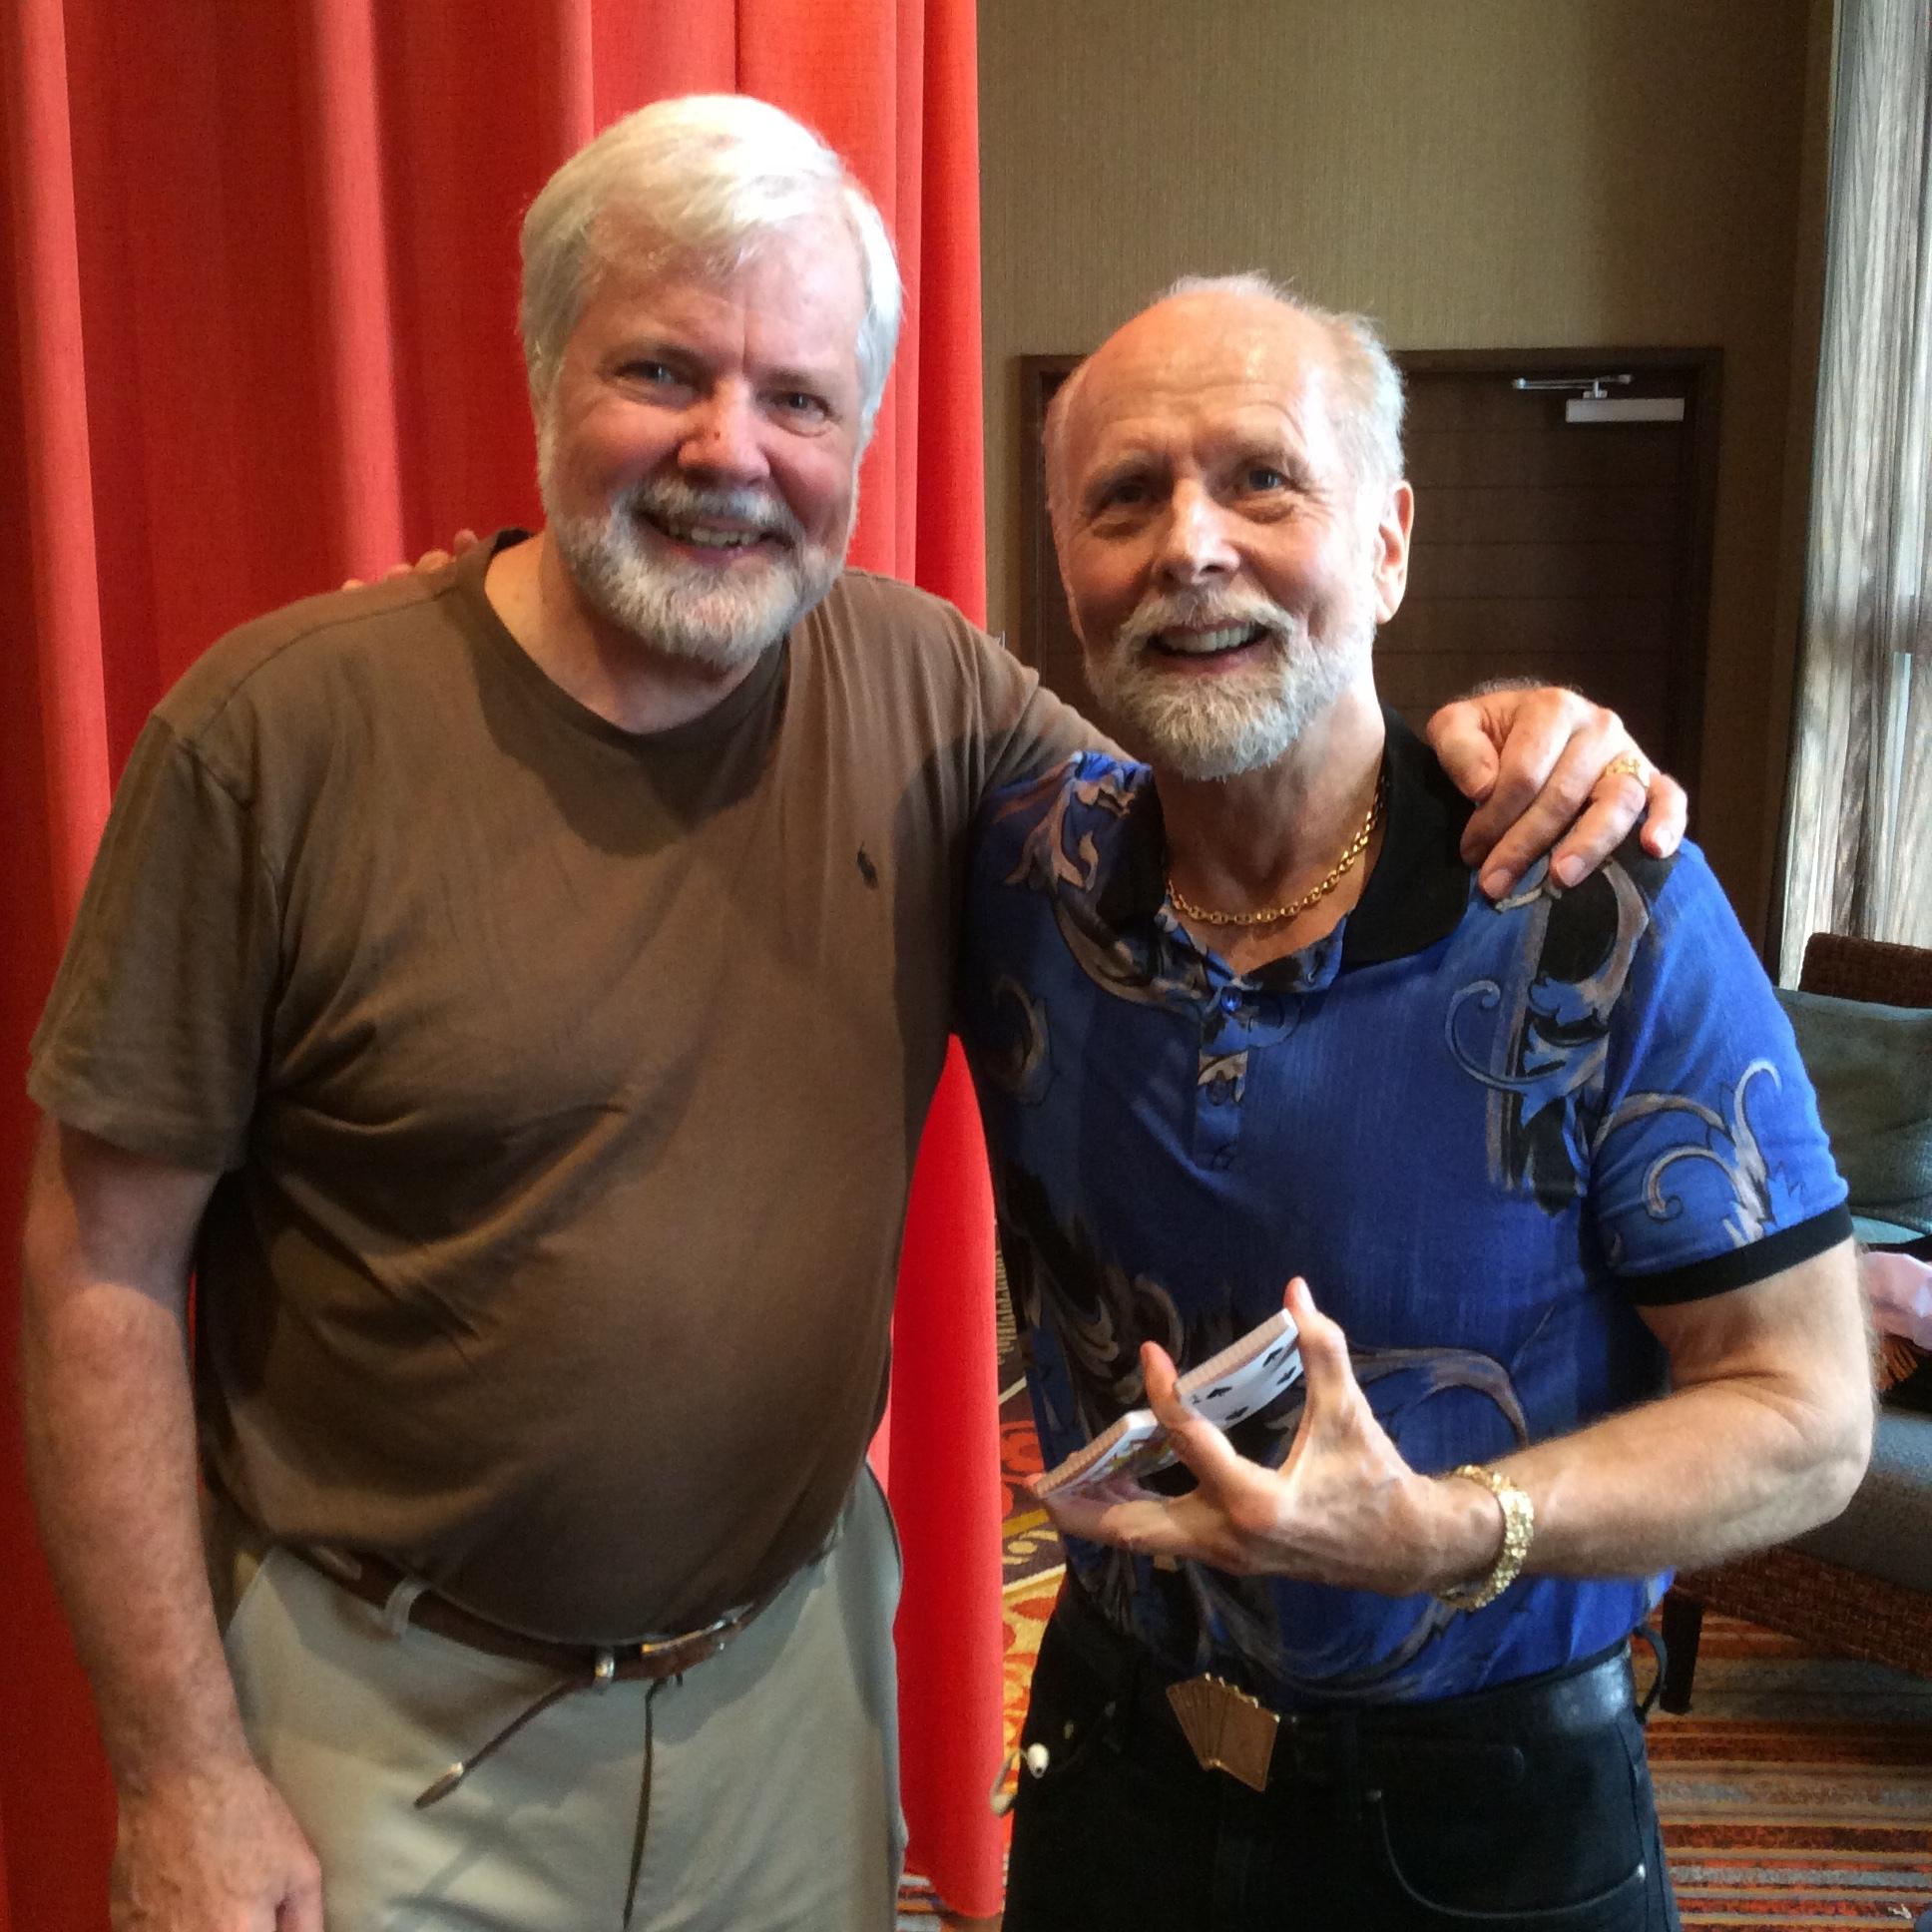 Scott with Richard Turner